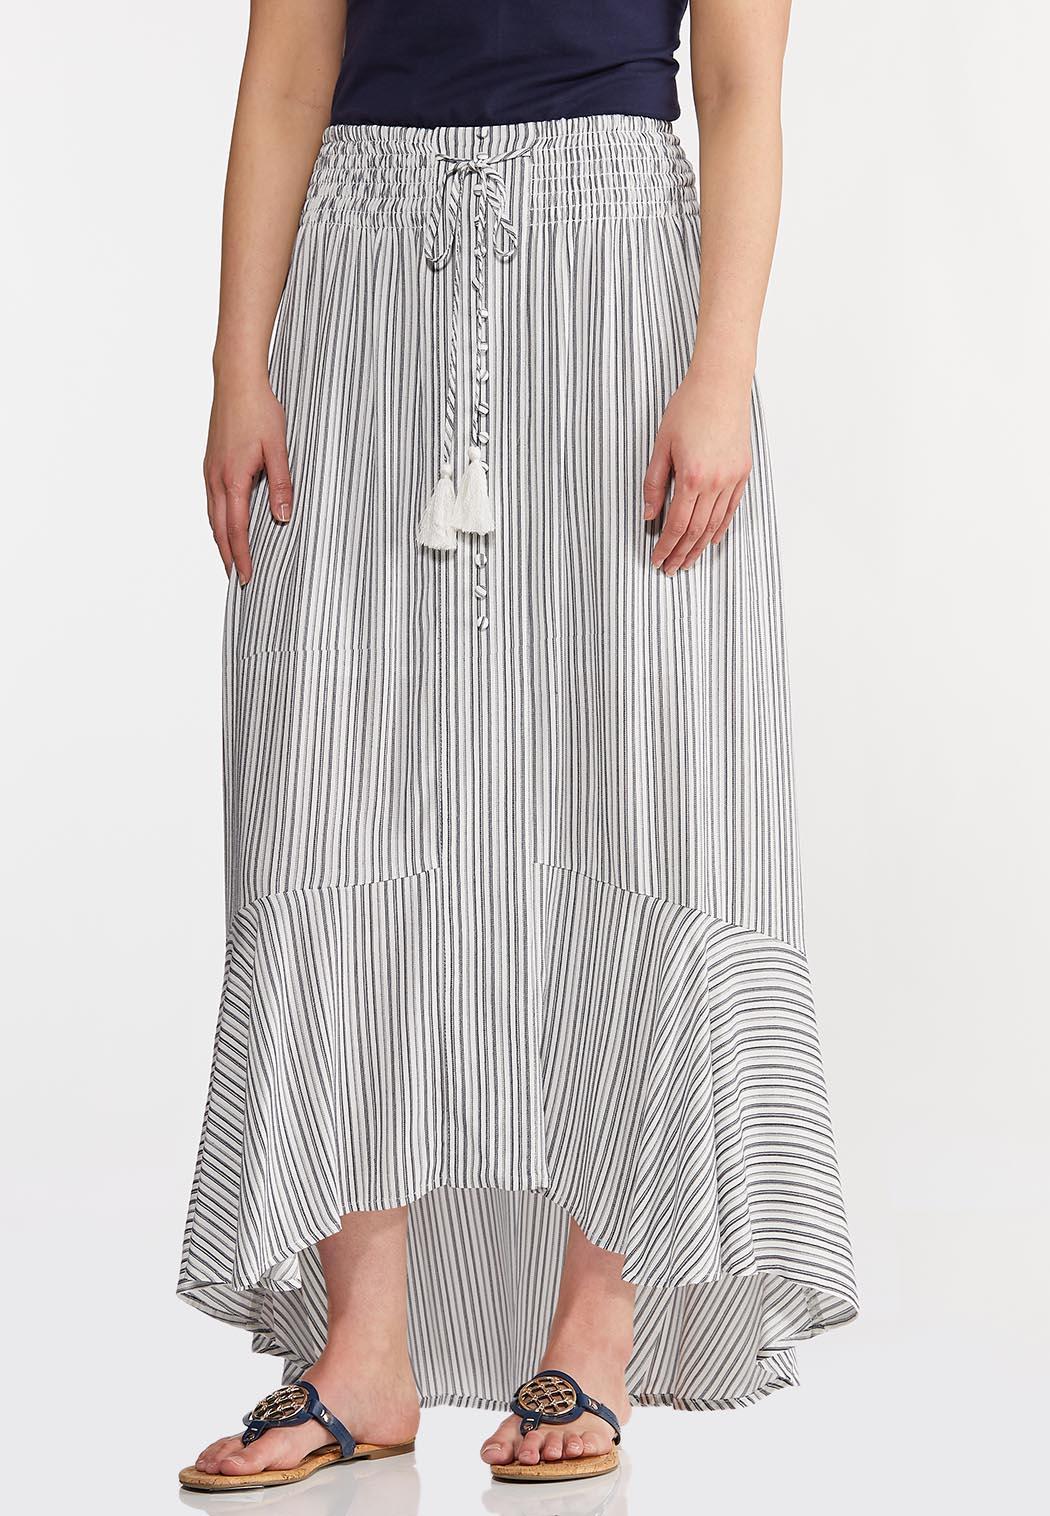 Plus Size Breezy Striped Maxi Skirt